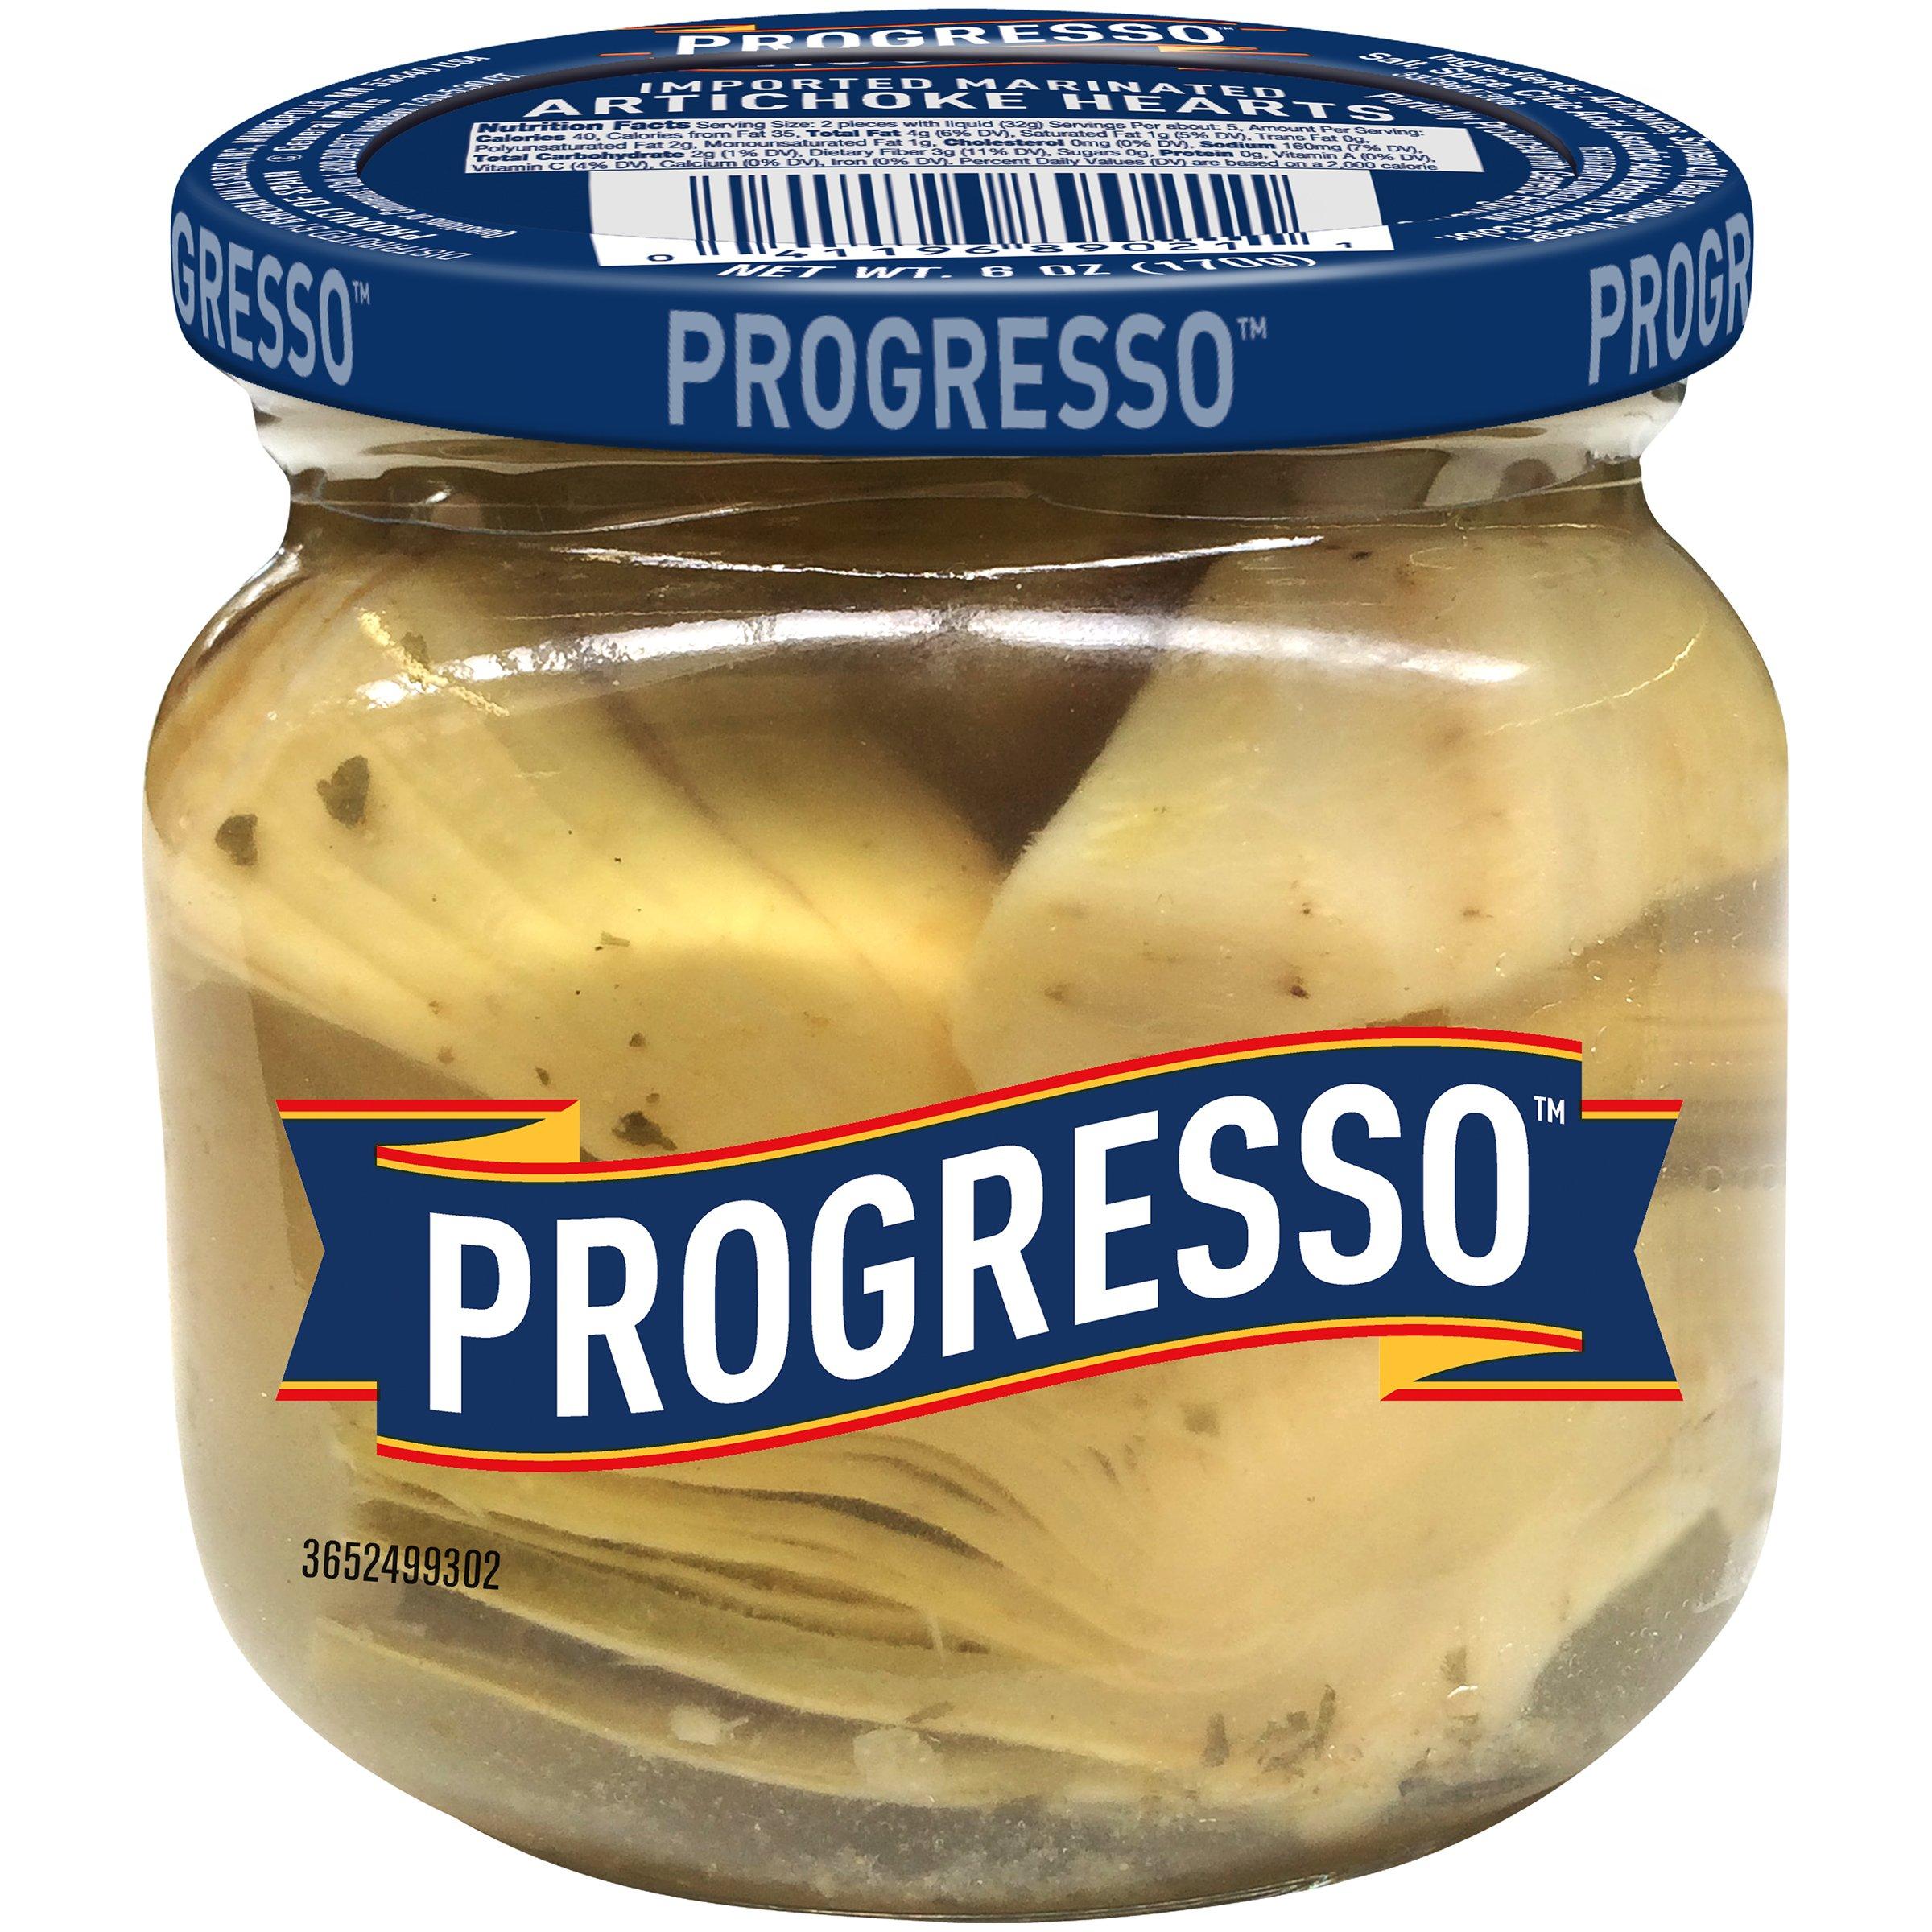 Progresso Imported Marinated Artichoke Hearts, 6 oz (pack of 6)